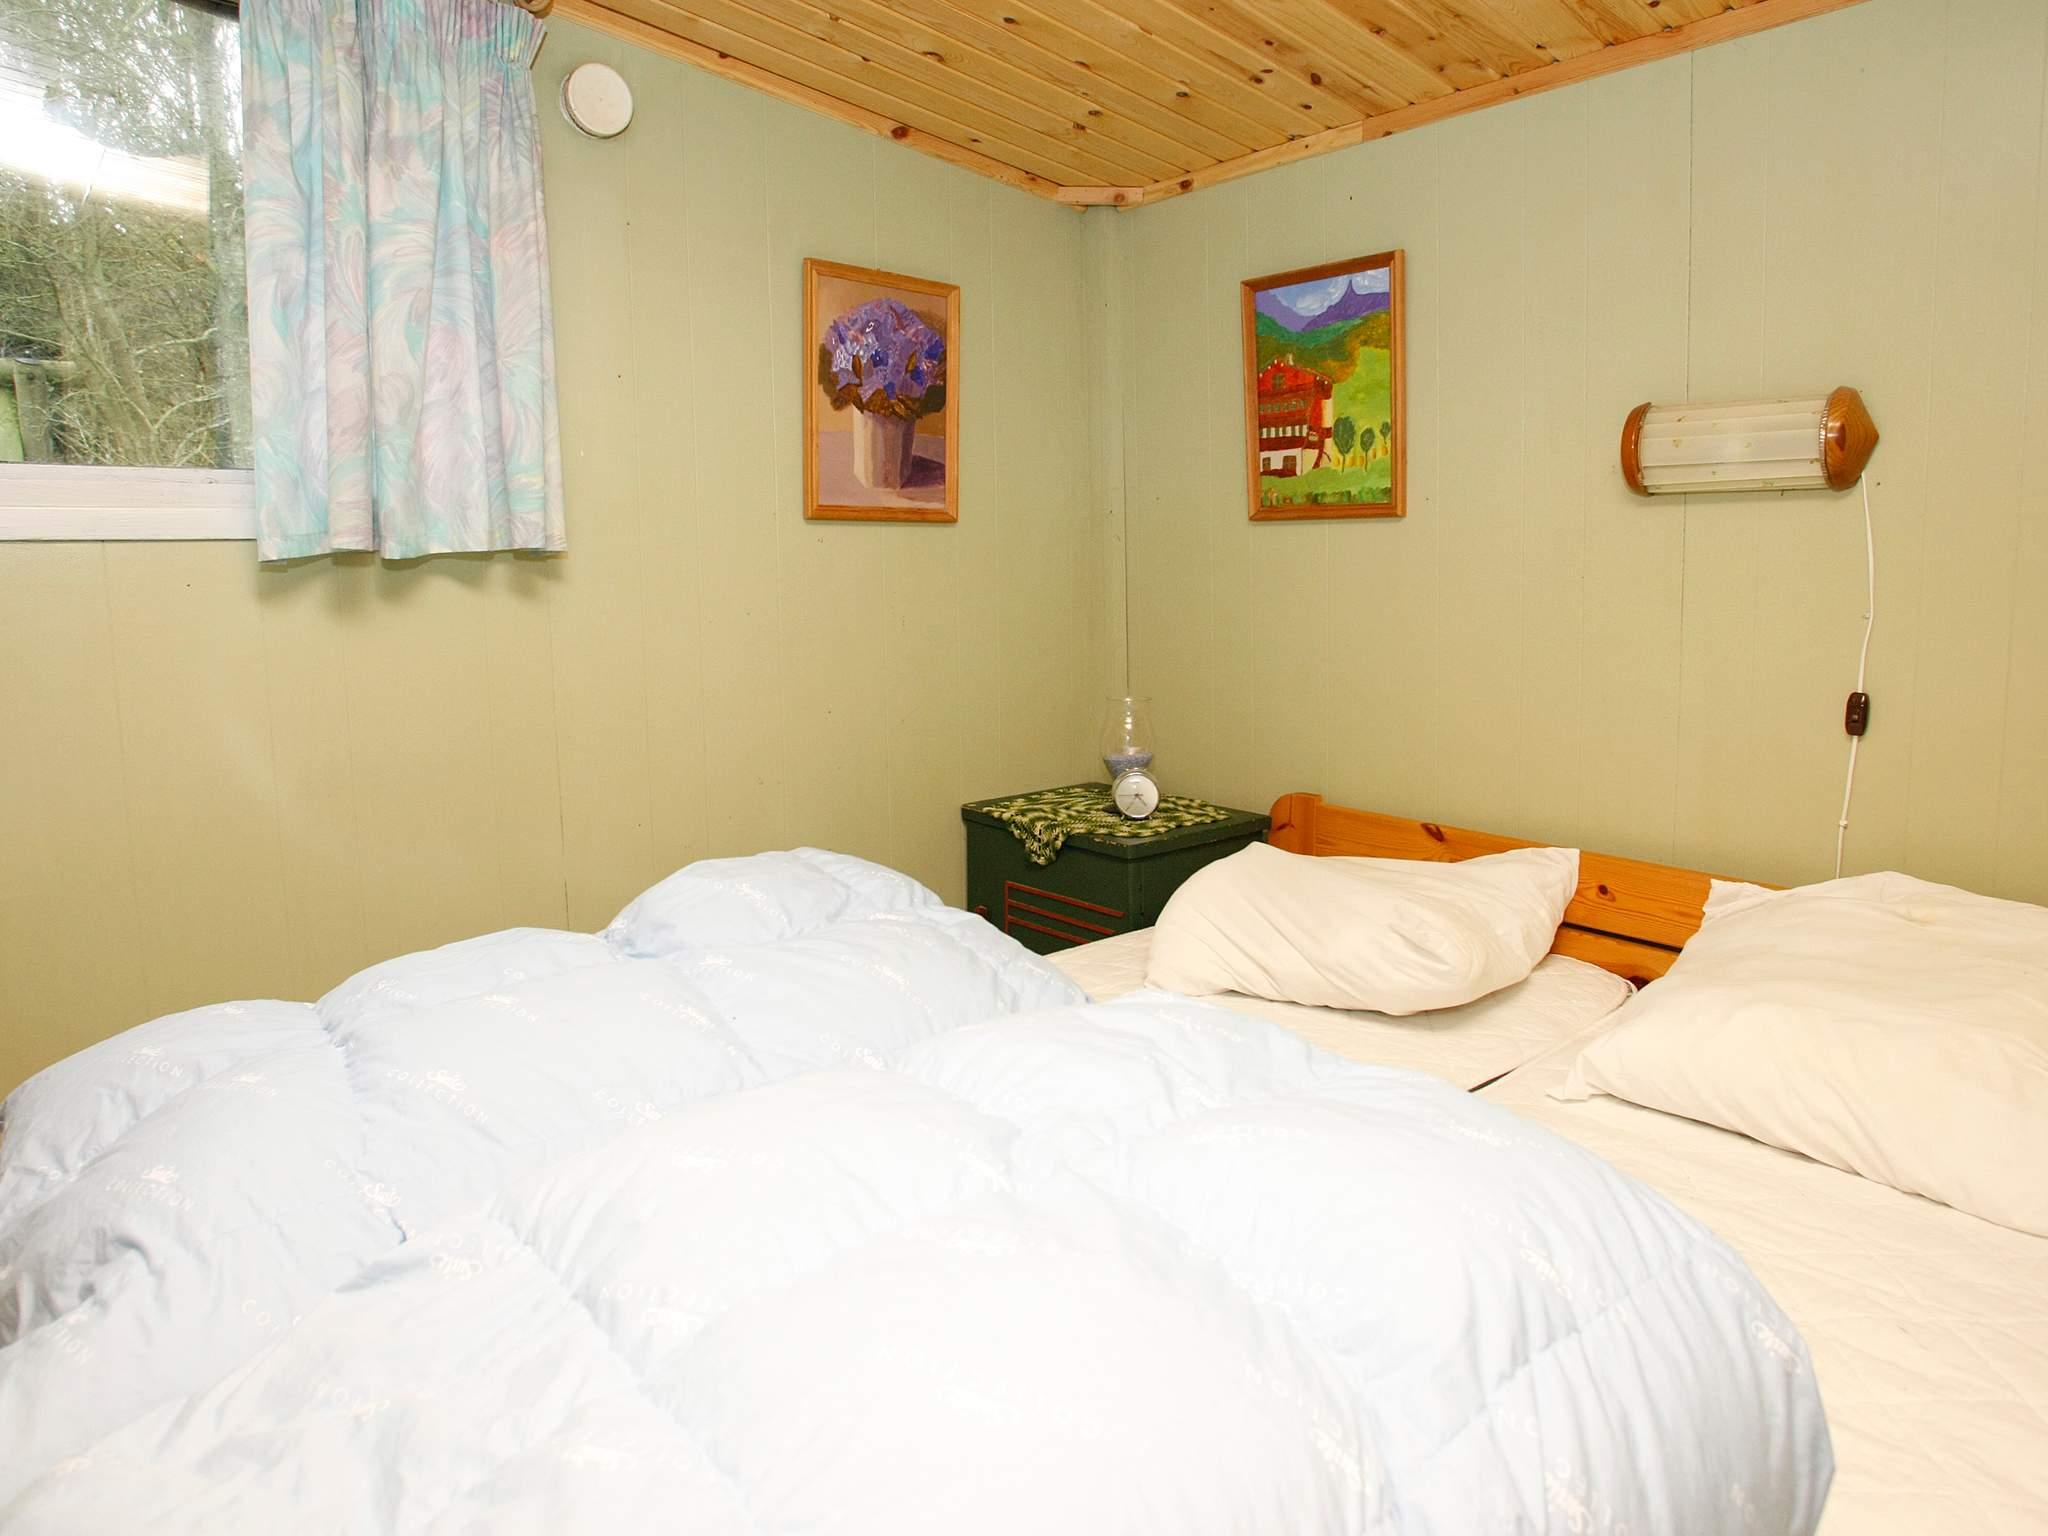 Ferienhaus Thyholm/Serup Strand (82880), Thyholm, Thyholm, Limfjord, Dänemark, Bild 10